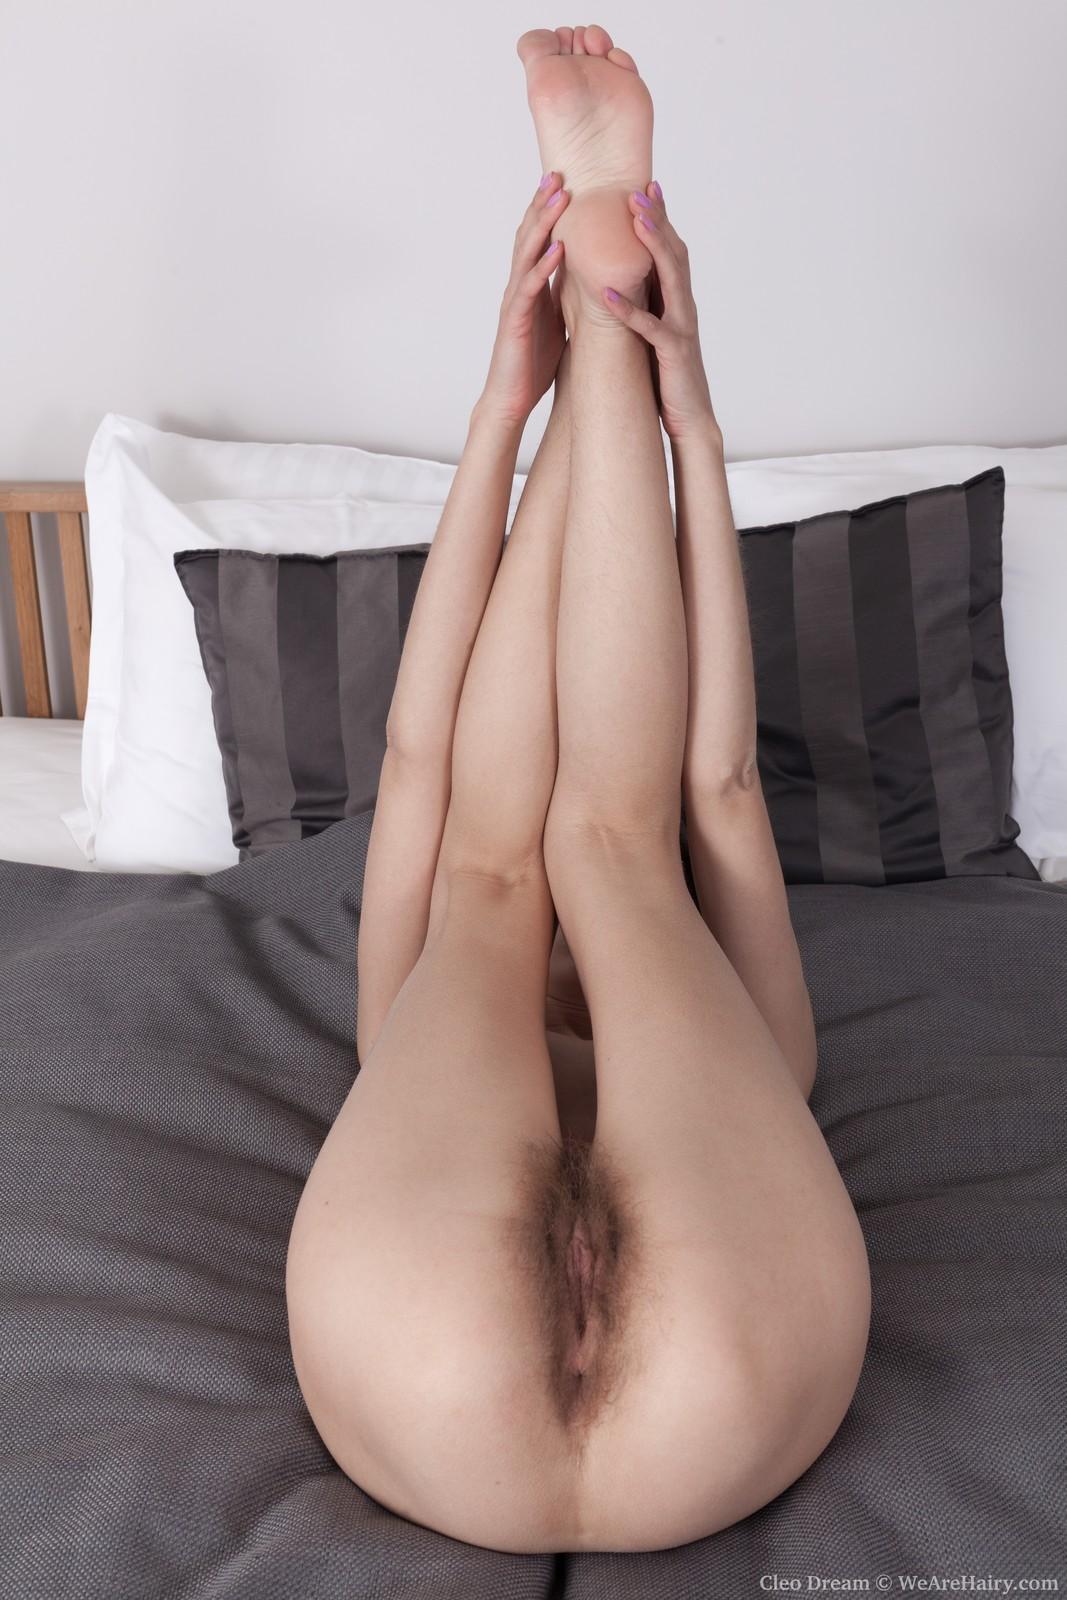 cleo-dream-slides-off-her-black-lingerie-in-bed13.jpg